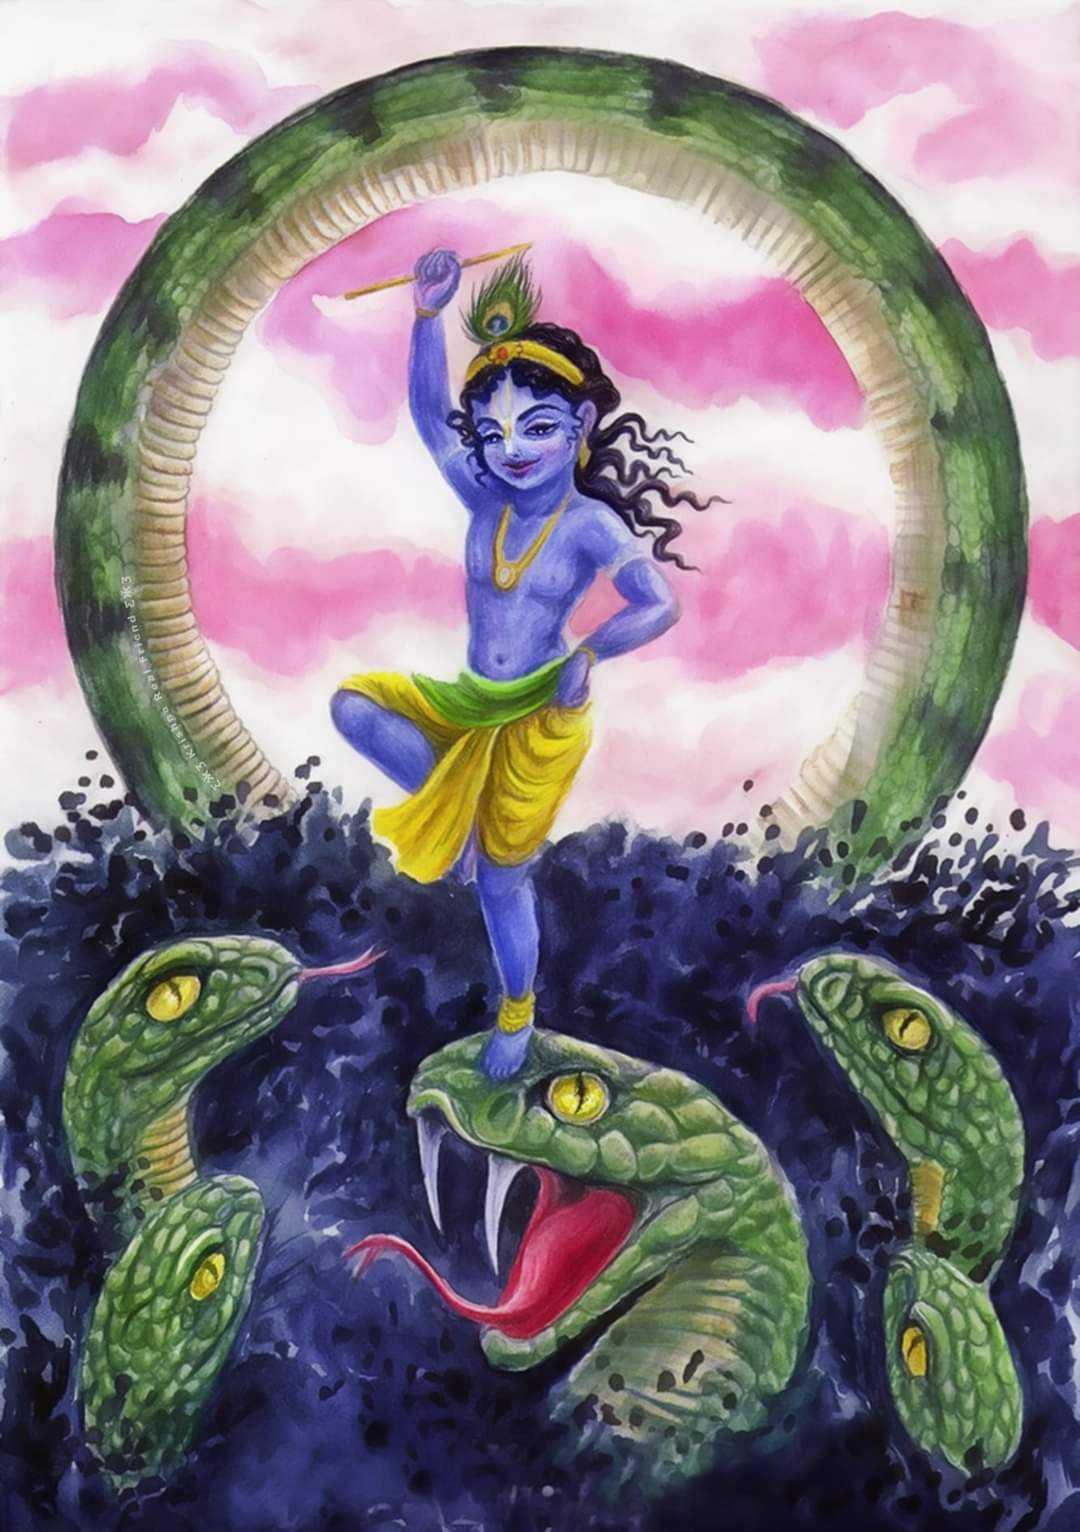 Little Krishna Kill Kaliya Naag - Little krishna kill kaliya naag in his childhood and save gokul peoples. Krishna show his divine leela to world.